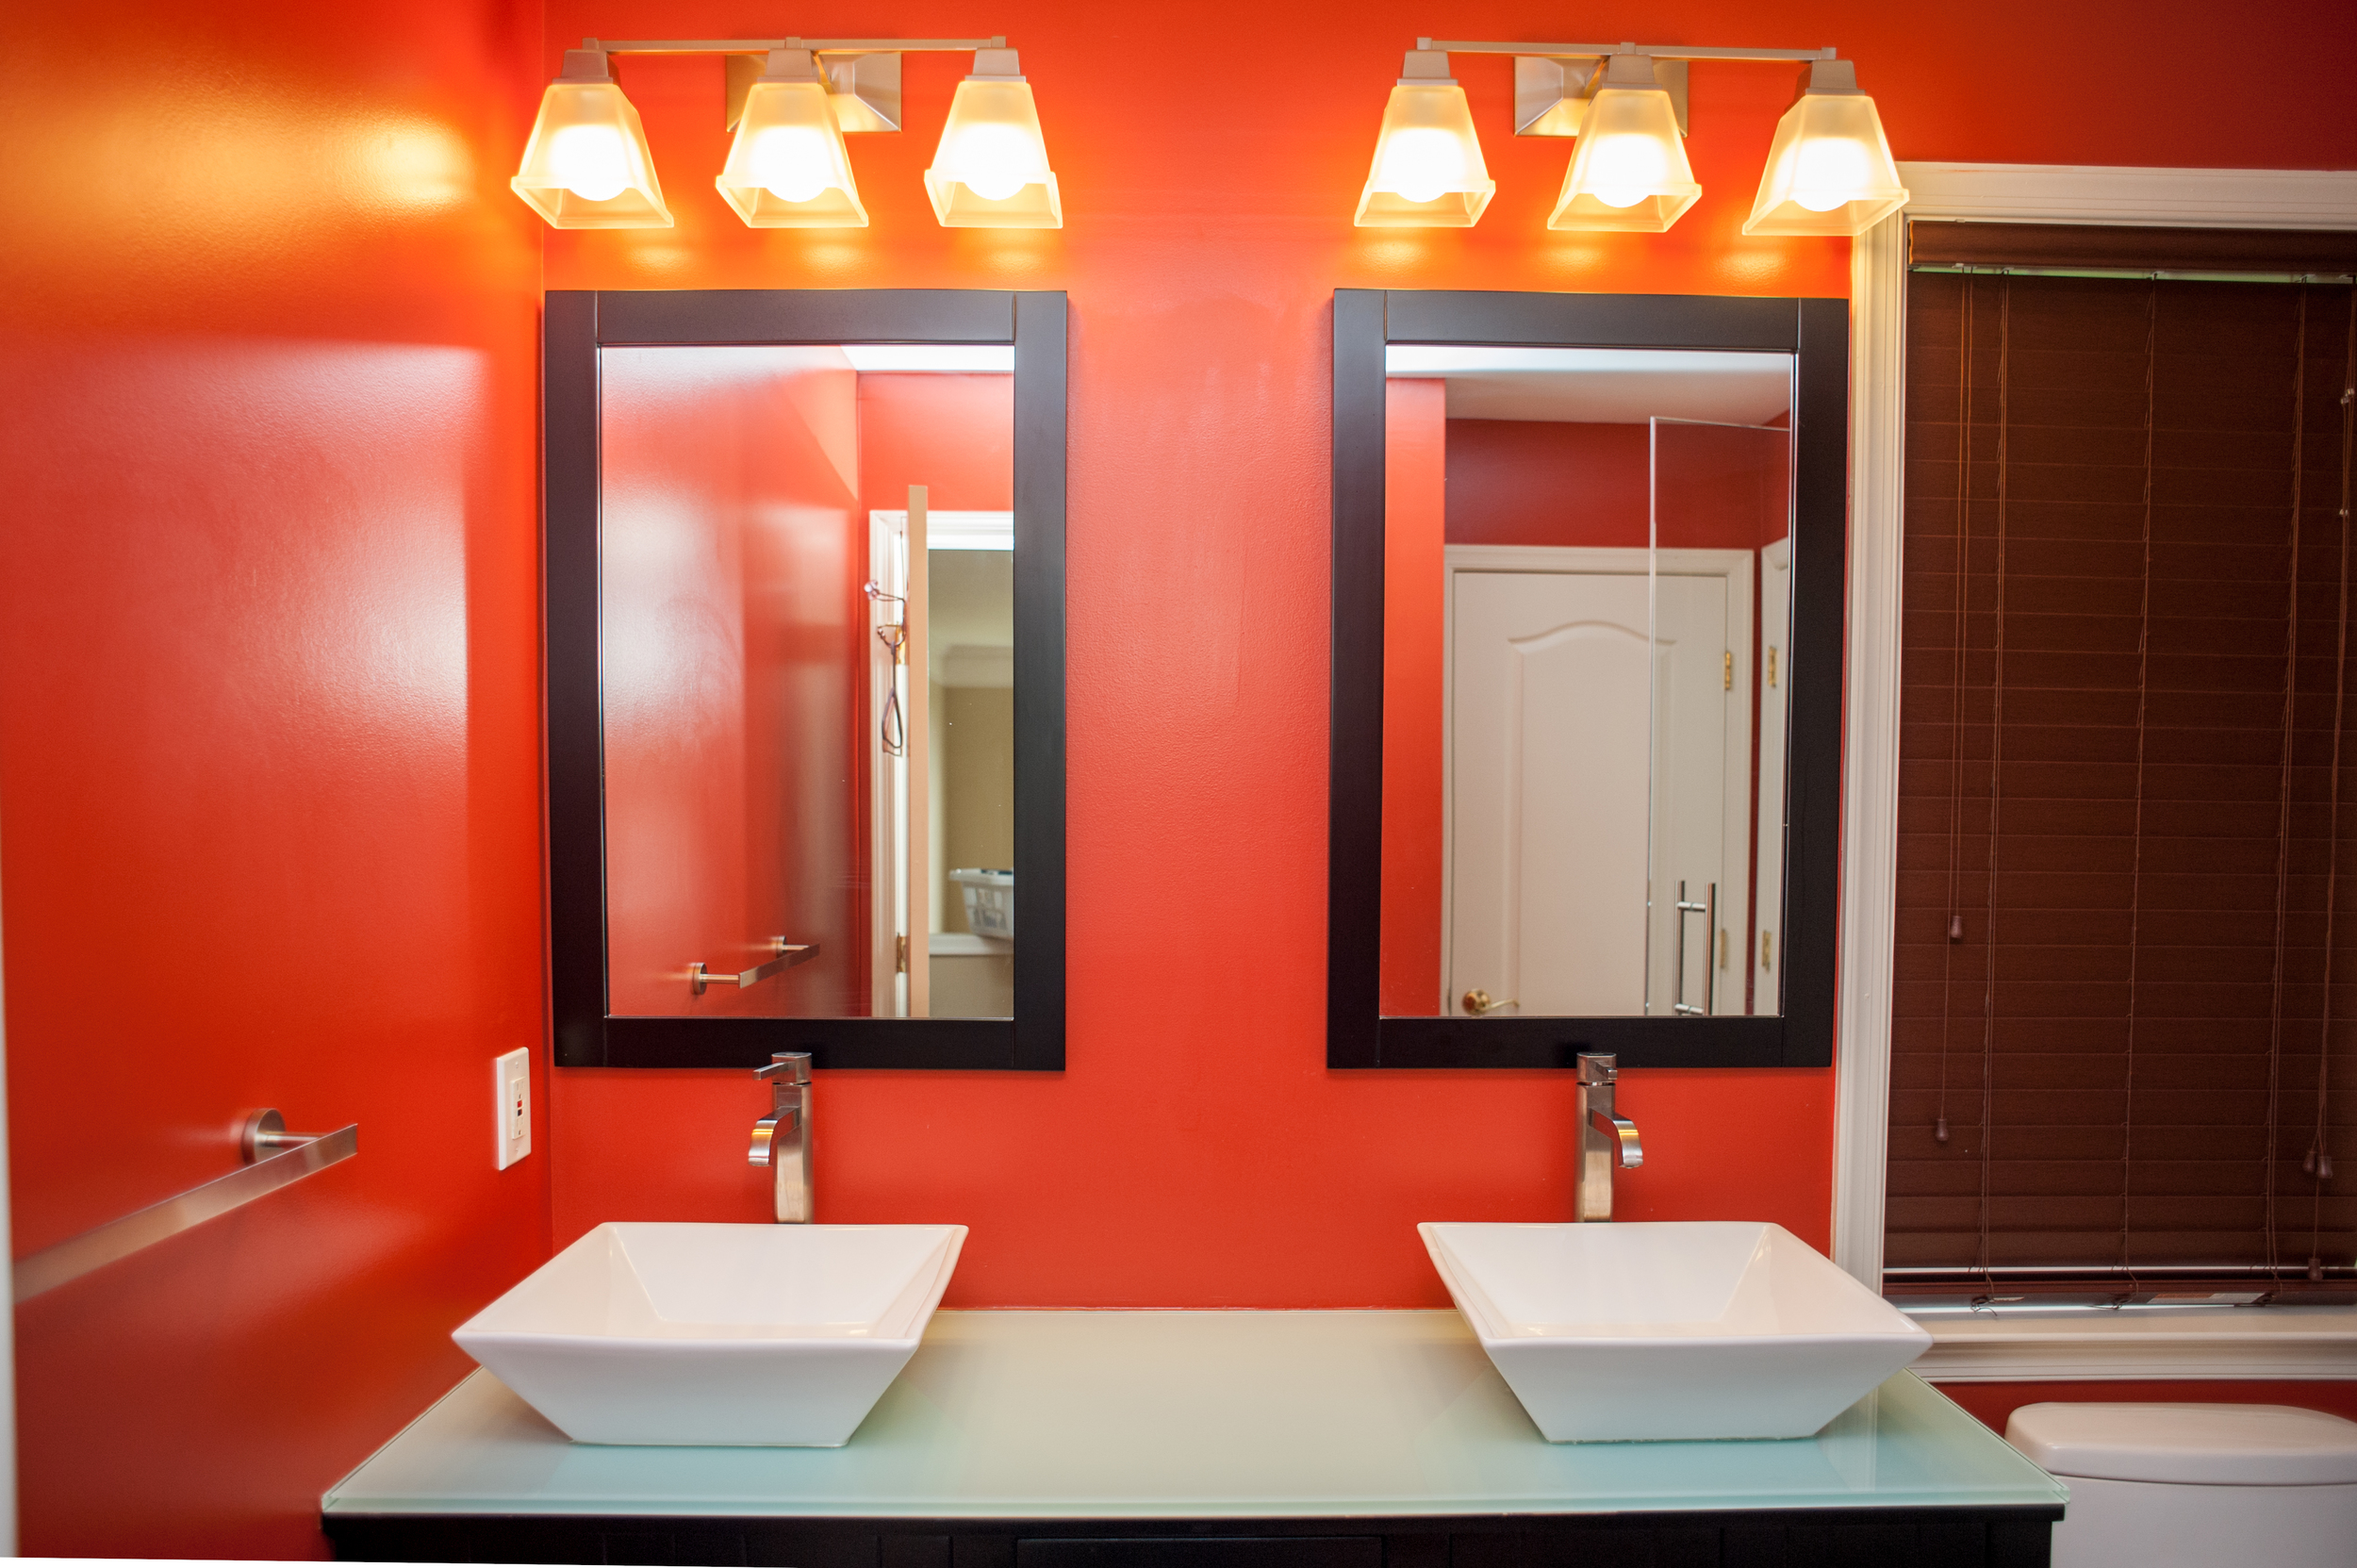 Bathroom Remodeling Fairfax Va gvidui -bathroom remodeling — euro design remodel - remodeler with